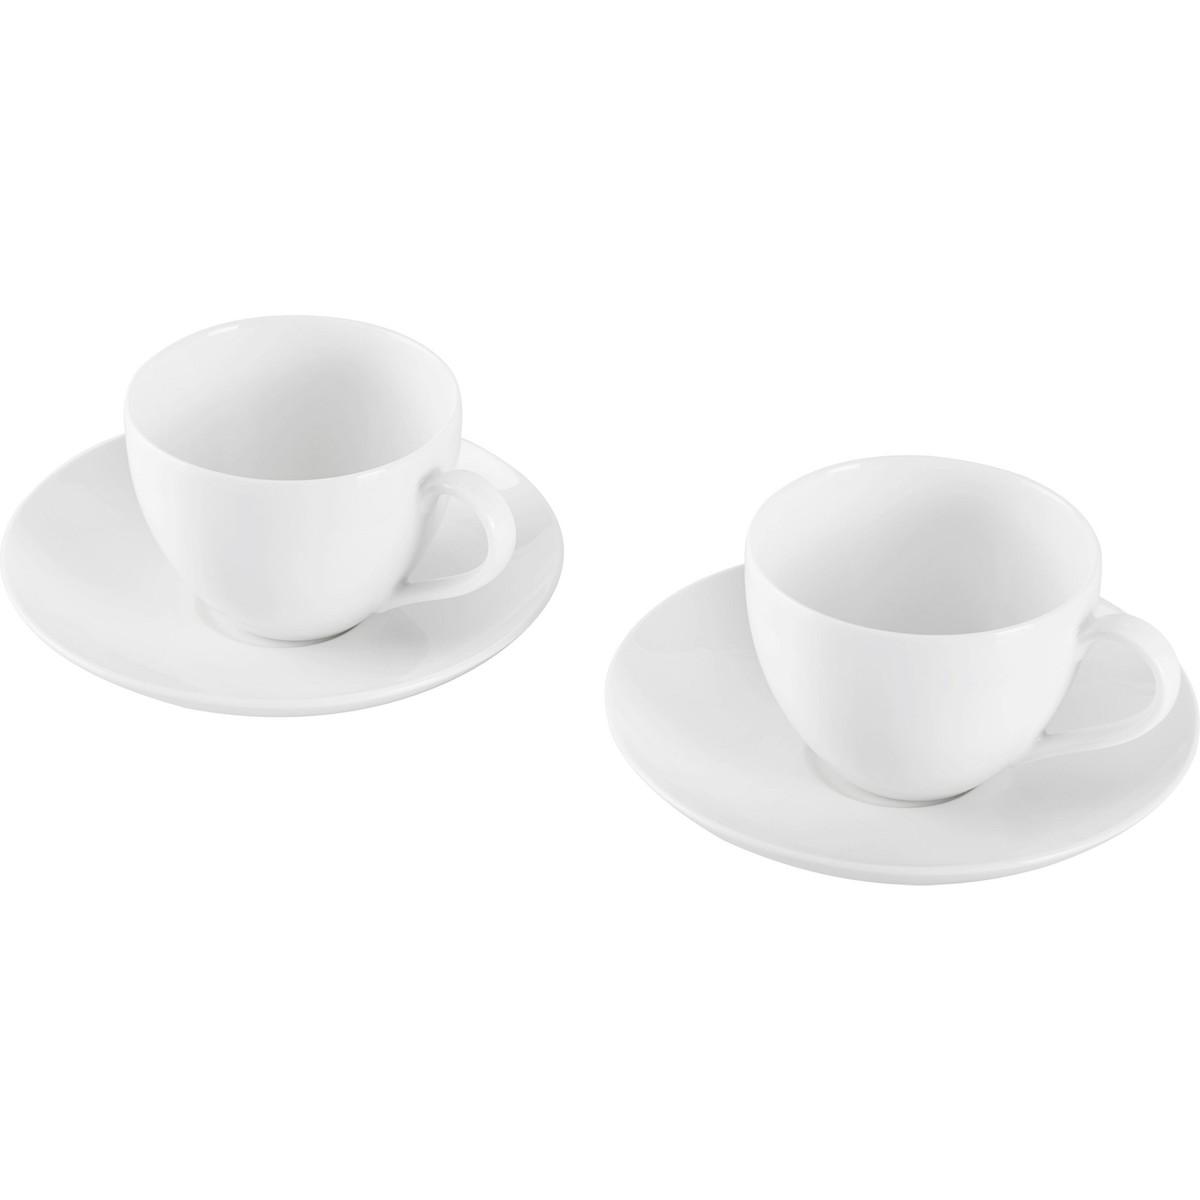 Bild 2 von Kaffeeset Vivo Hot Basics 4-tlg